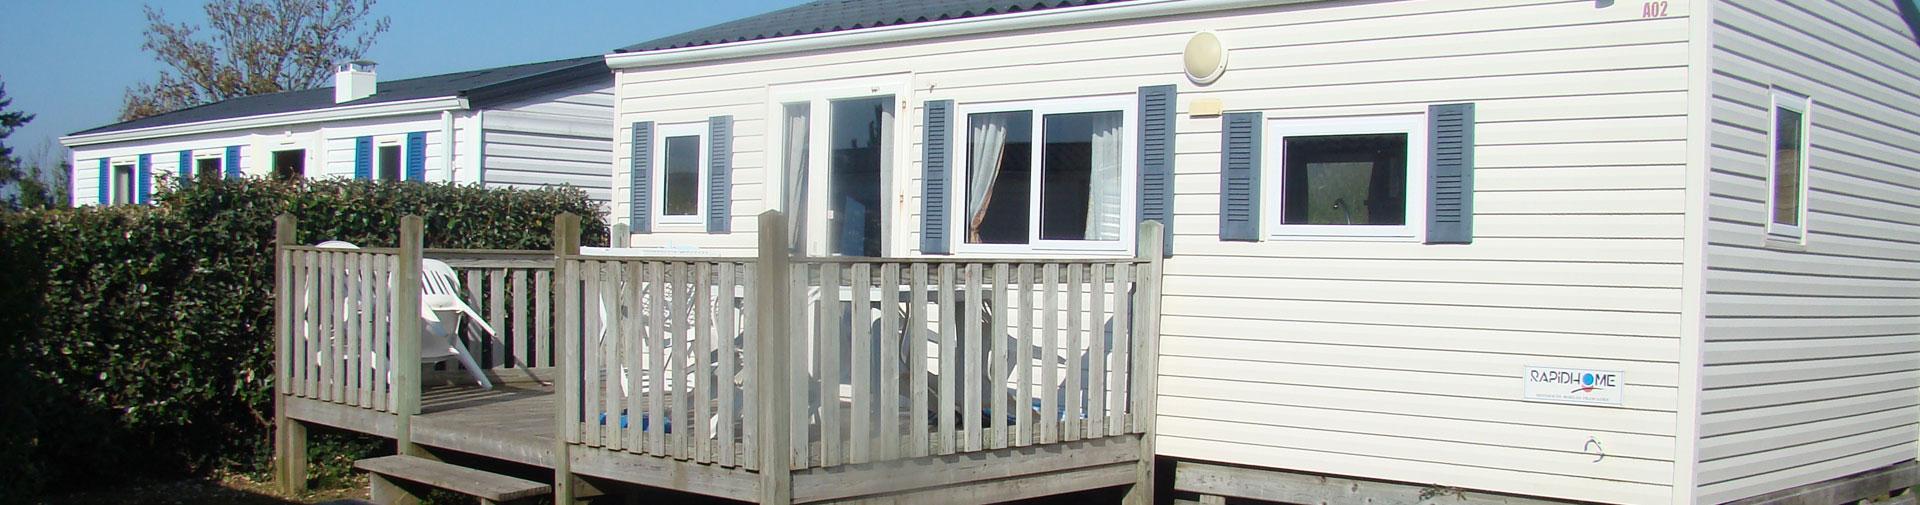 location-mobil-home-loft